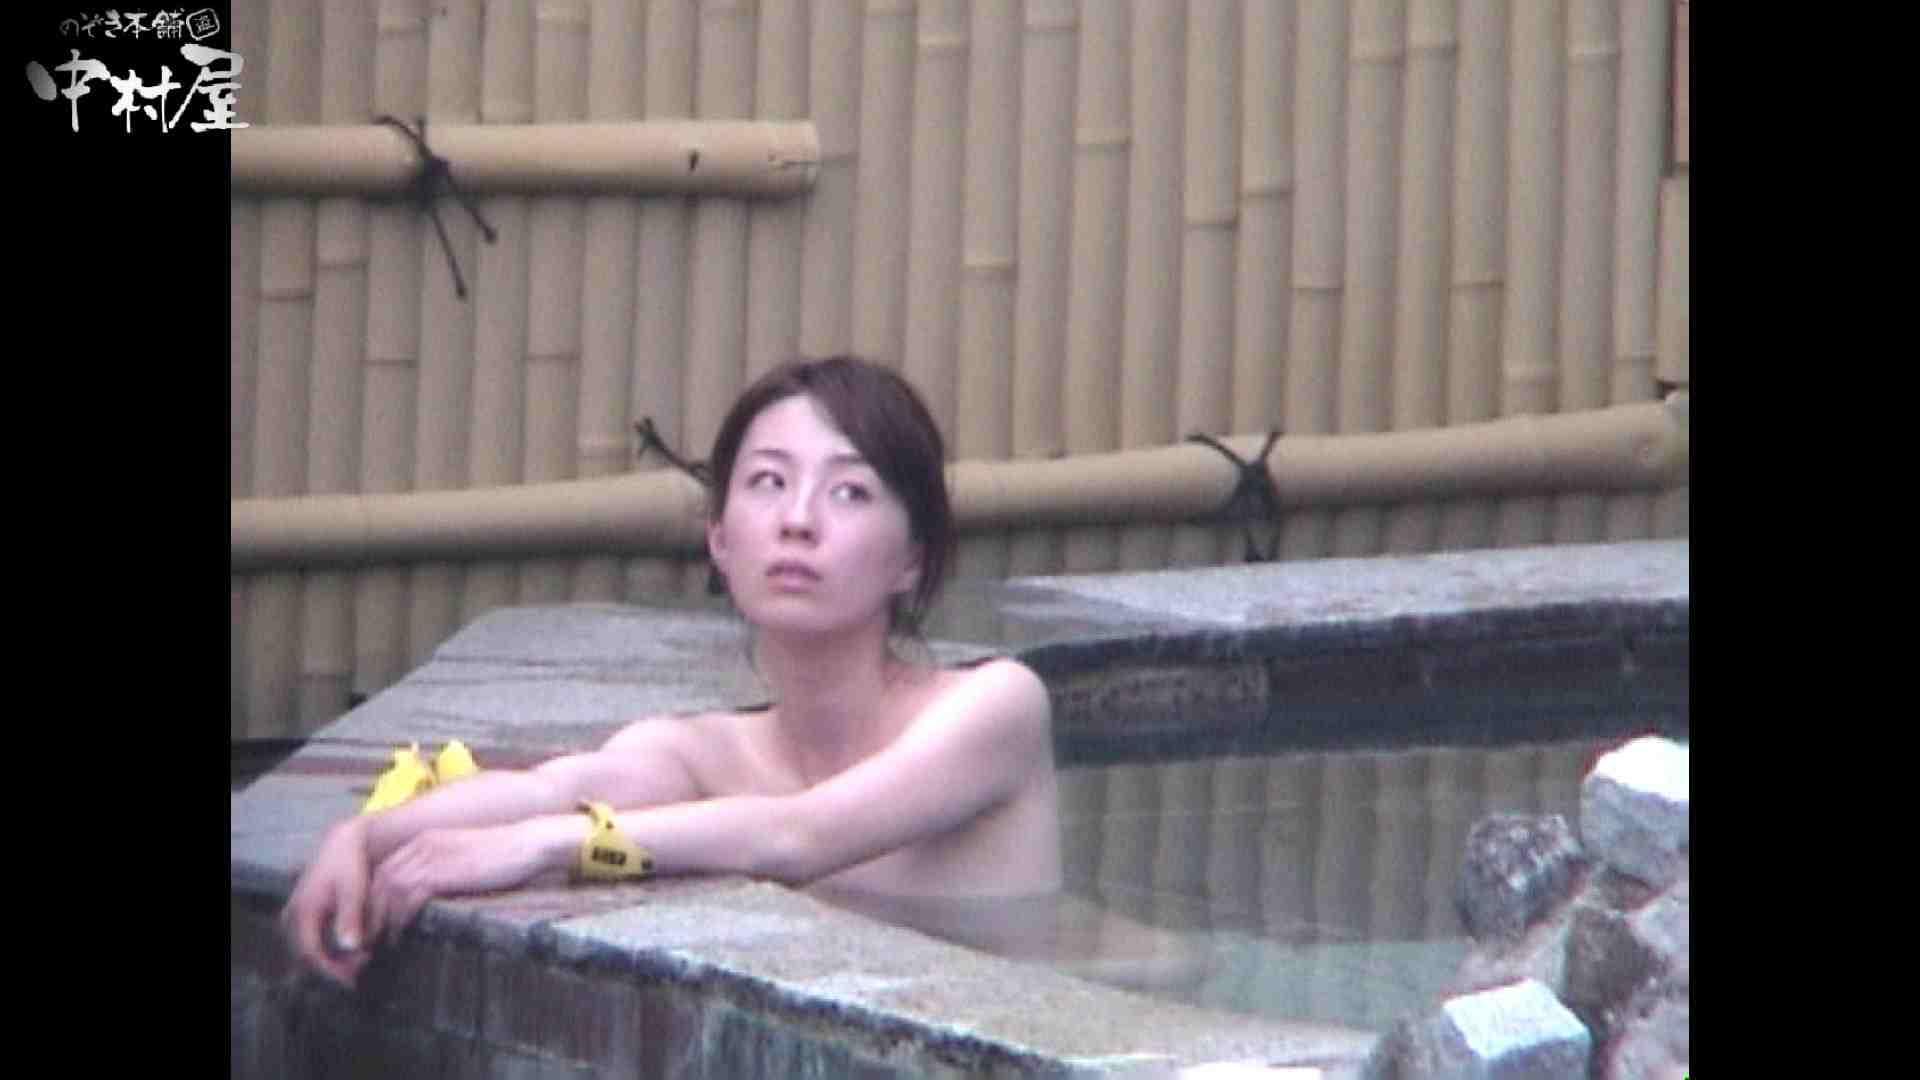 Aquaな露天風呂Vol.964 0   0  30連発 17